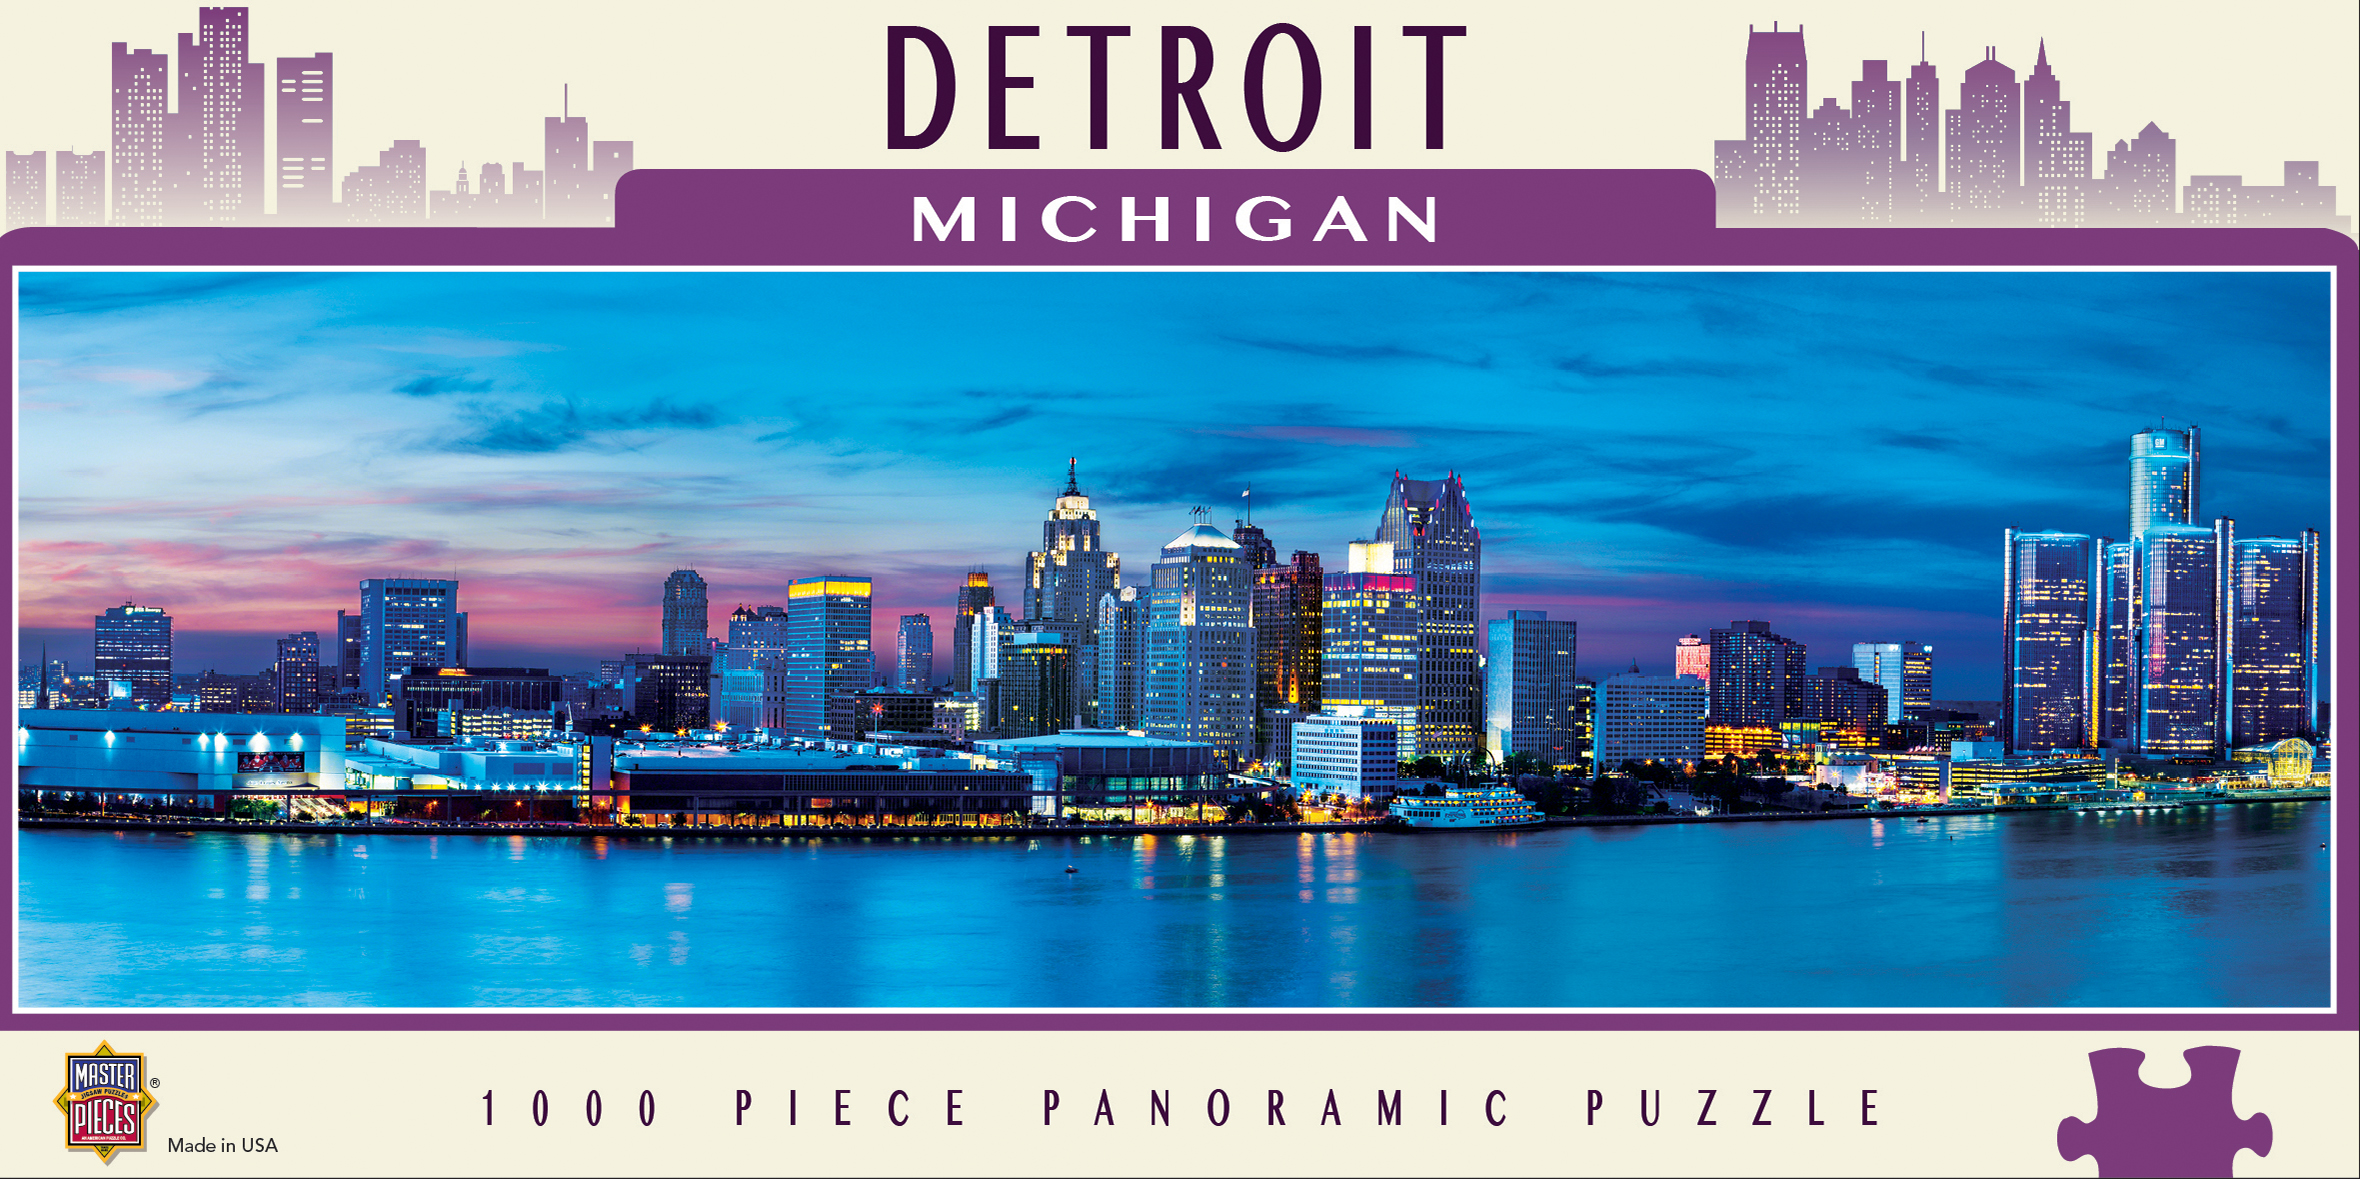 Detroit - Scratch and Dent Skyline / Cityscape Jigsaw Puzzle